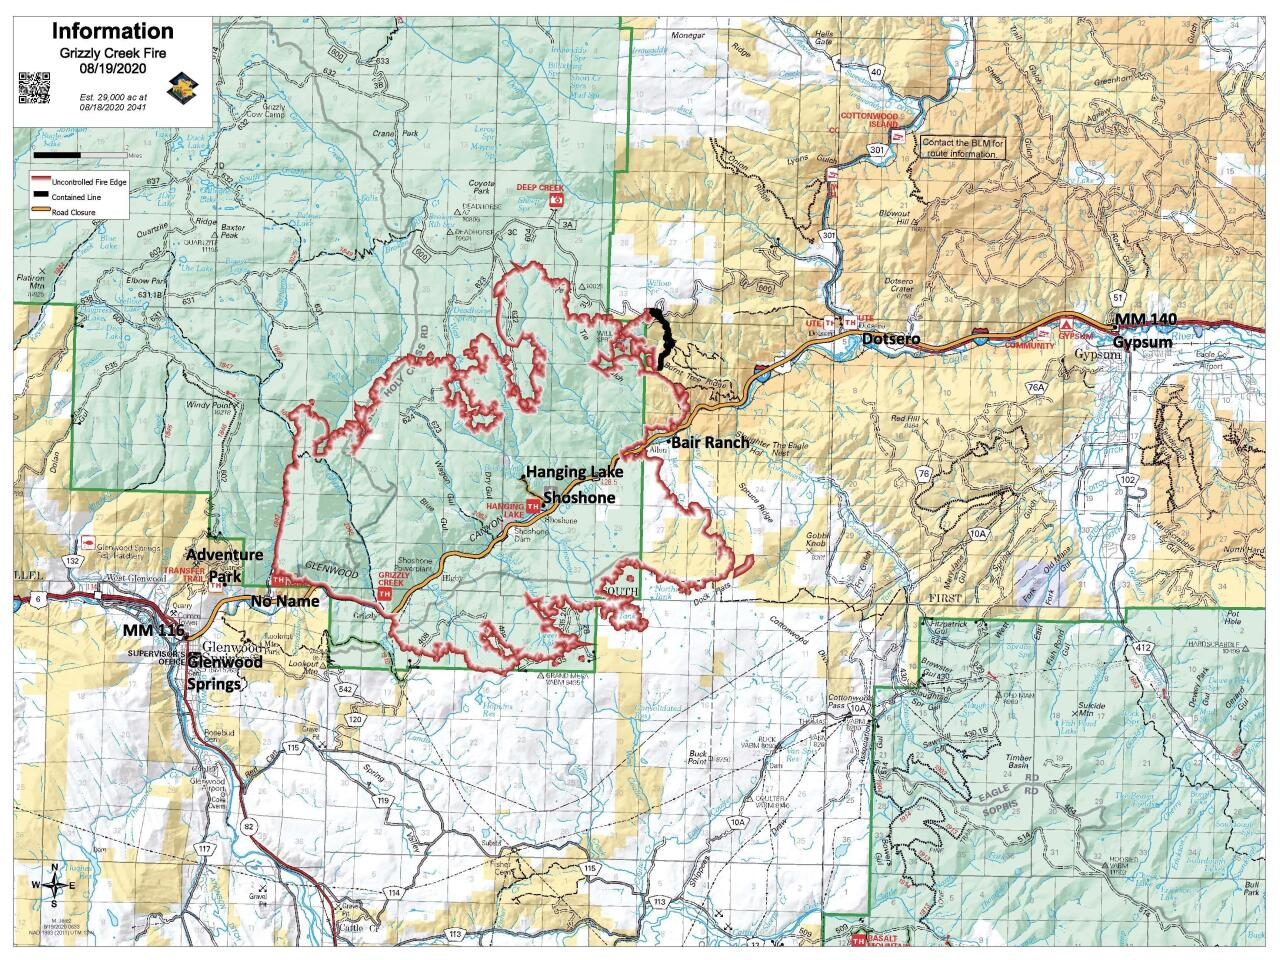 grizzlycreekmap-aug19.jpeg